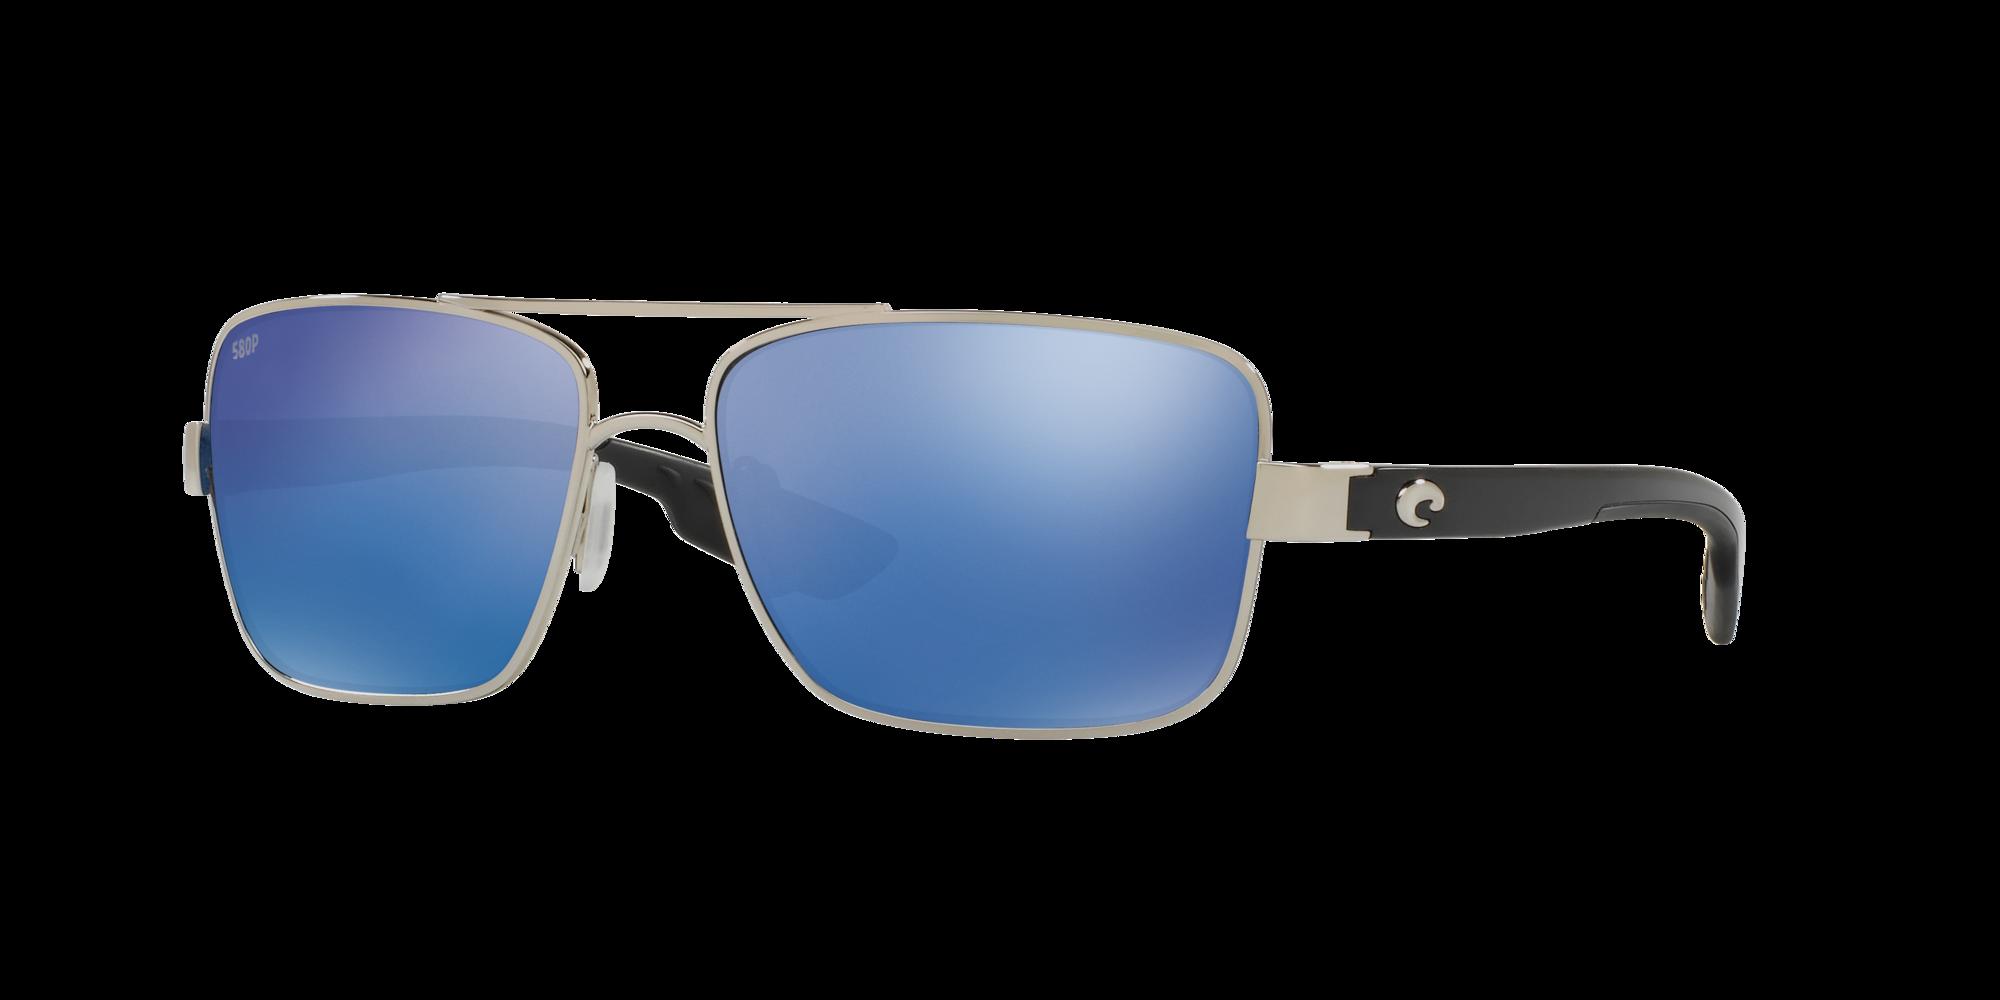 New Costa North Turn Sunglasses 580P Copp Silver Mir Lens Rose Gold Frames NIB